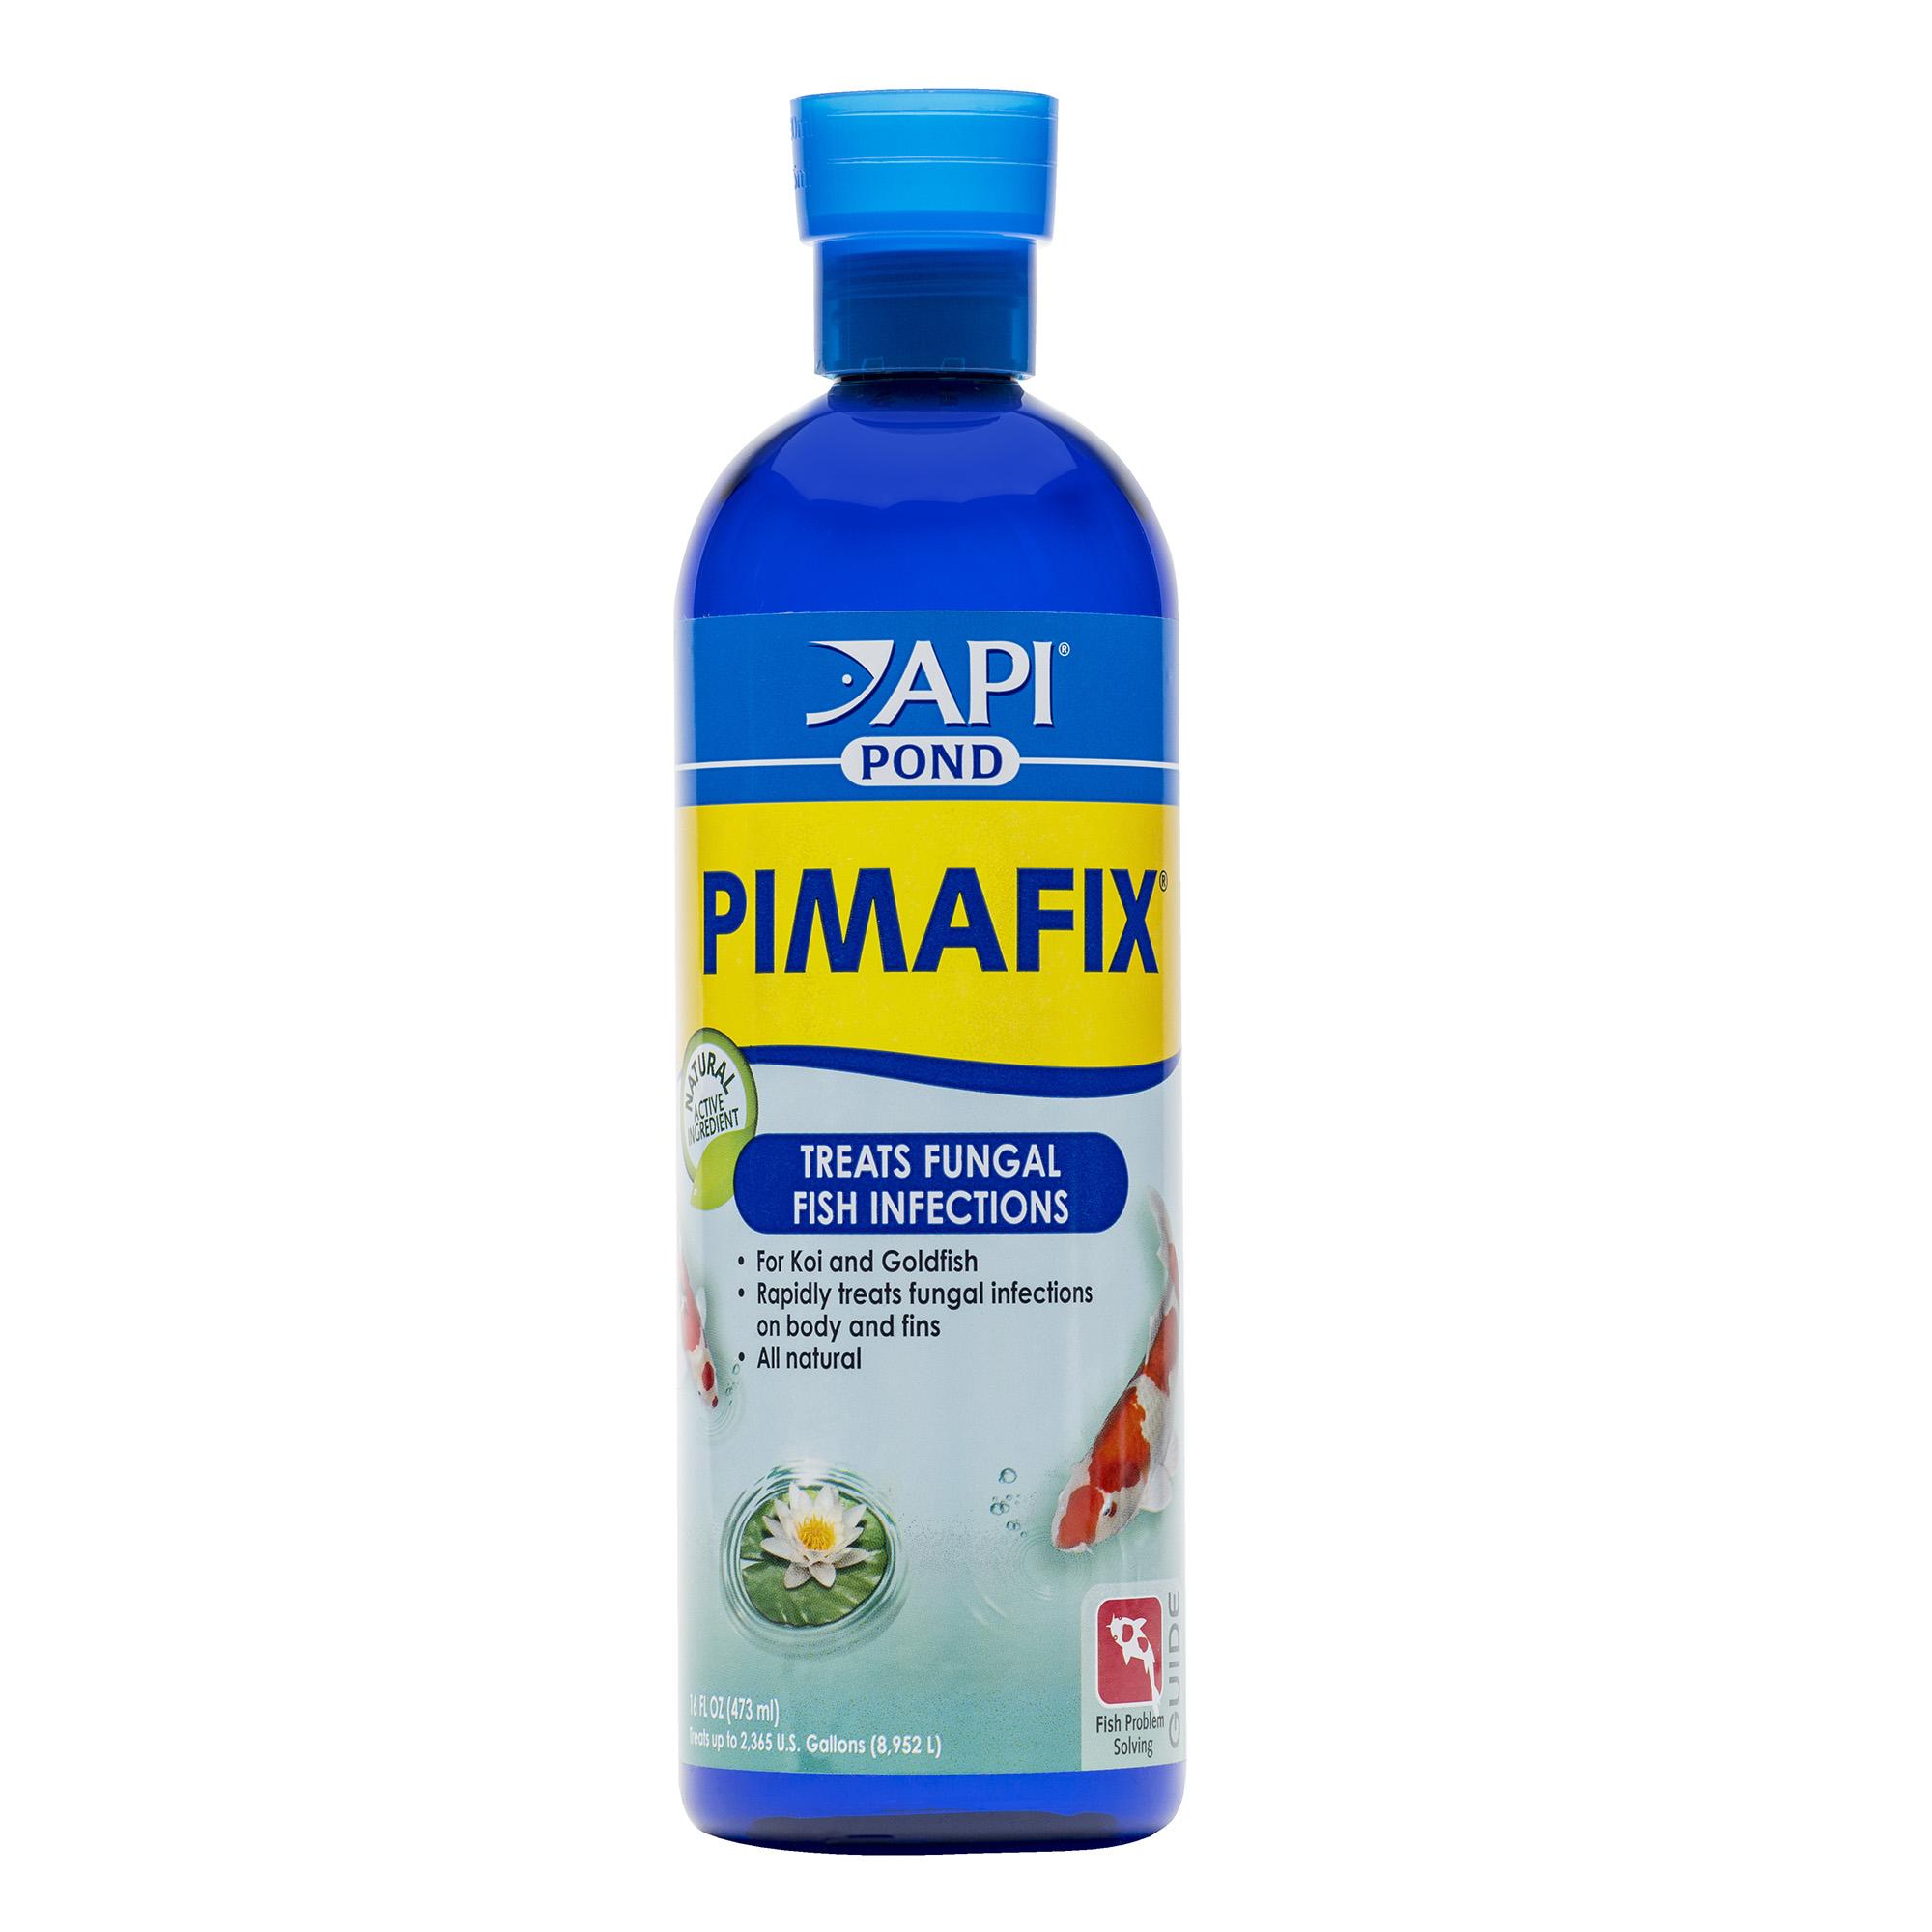 POND PIMAFIX™